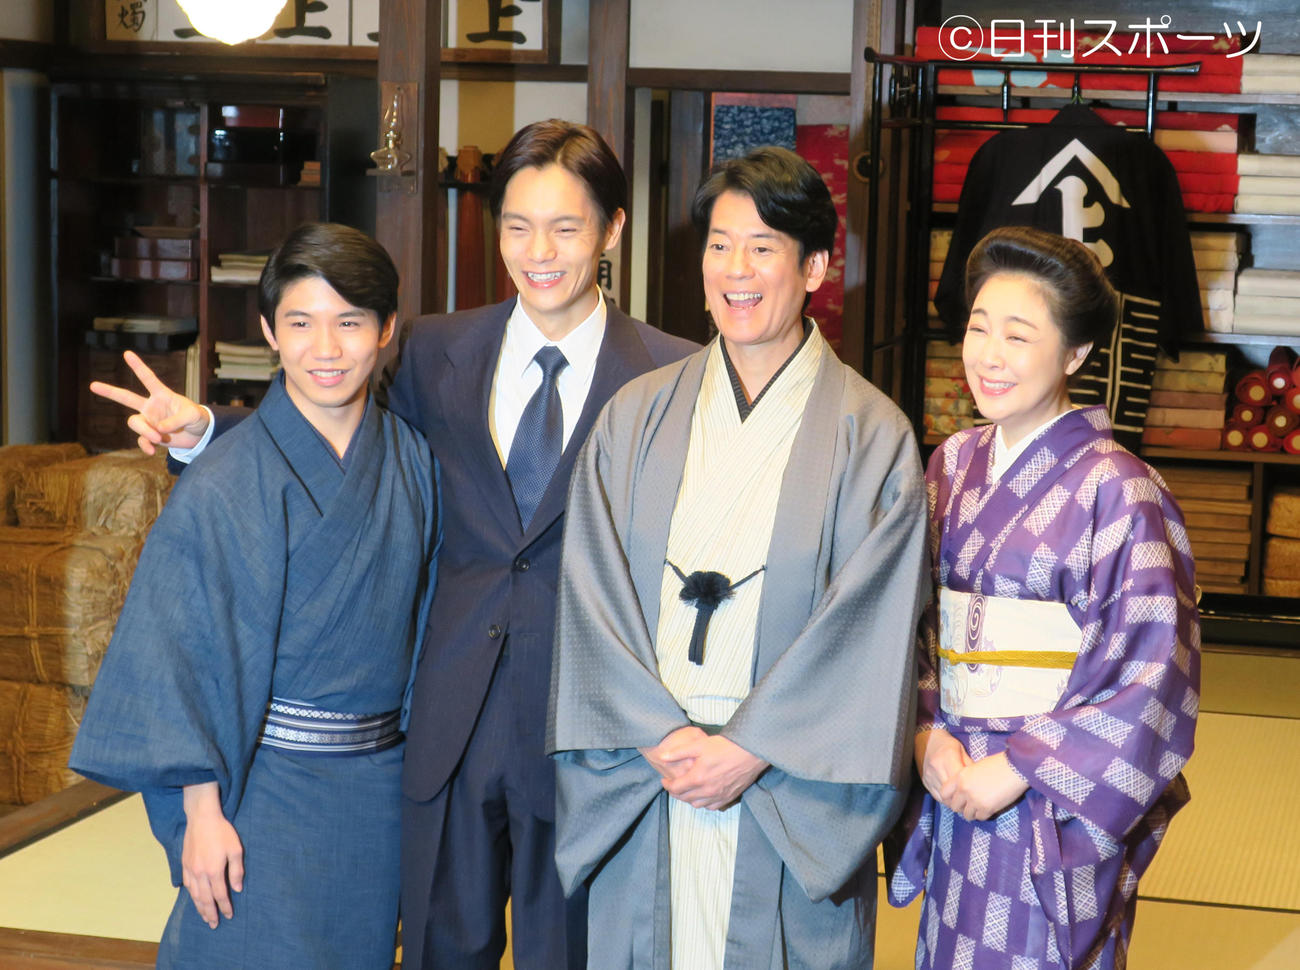 NHK連続テレビ小説「エール」のスタジオ取材会を行った出演者たち。左から佐久本宝、窪田正孝、唐沢寿明、菊池桃子